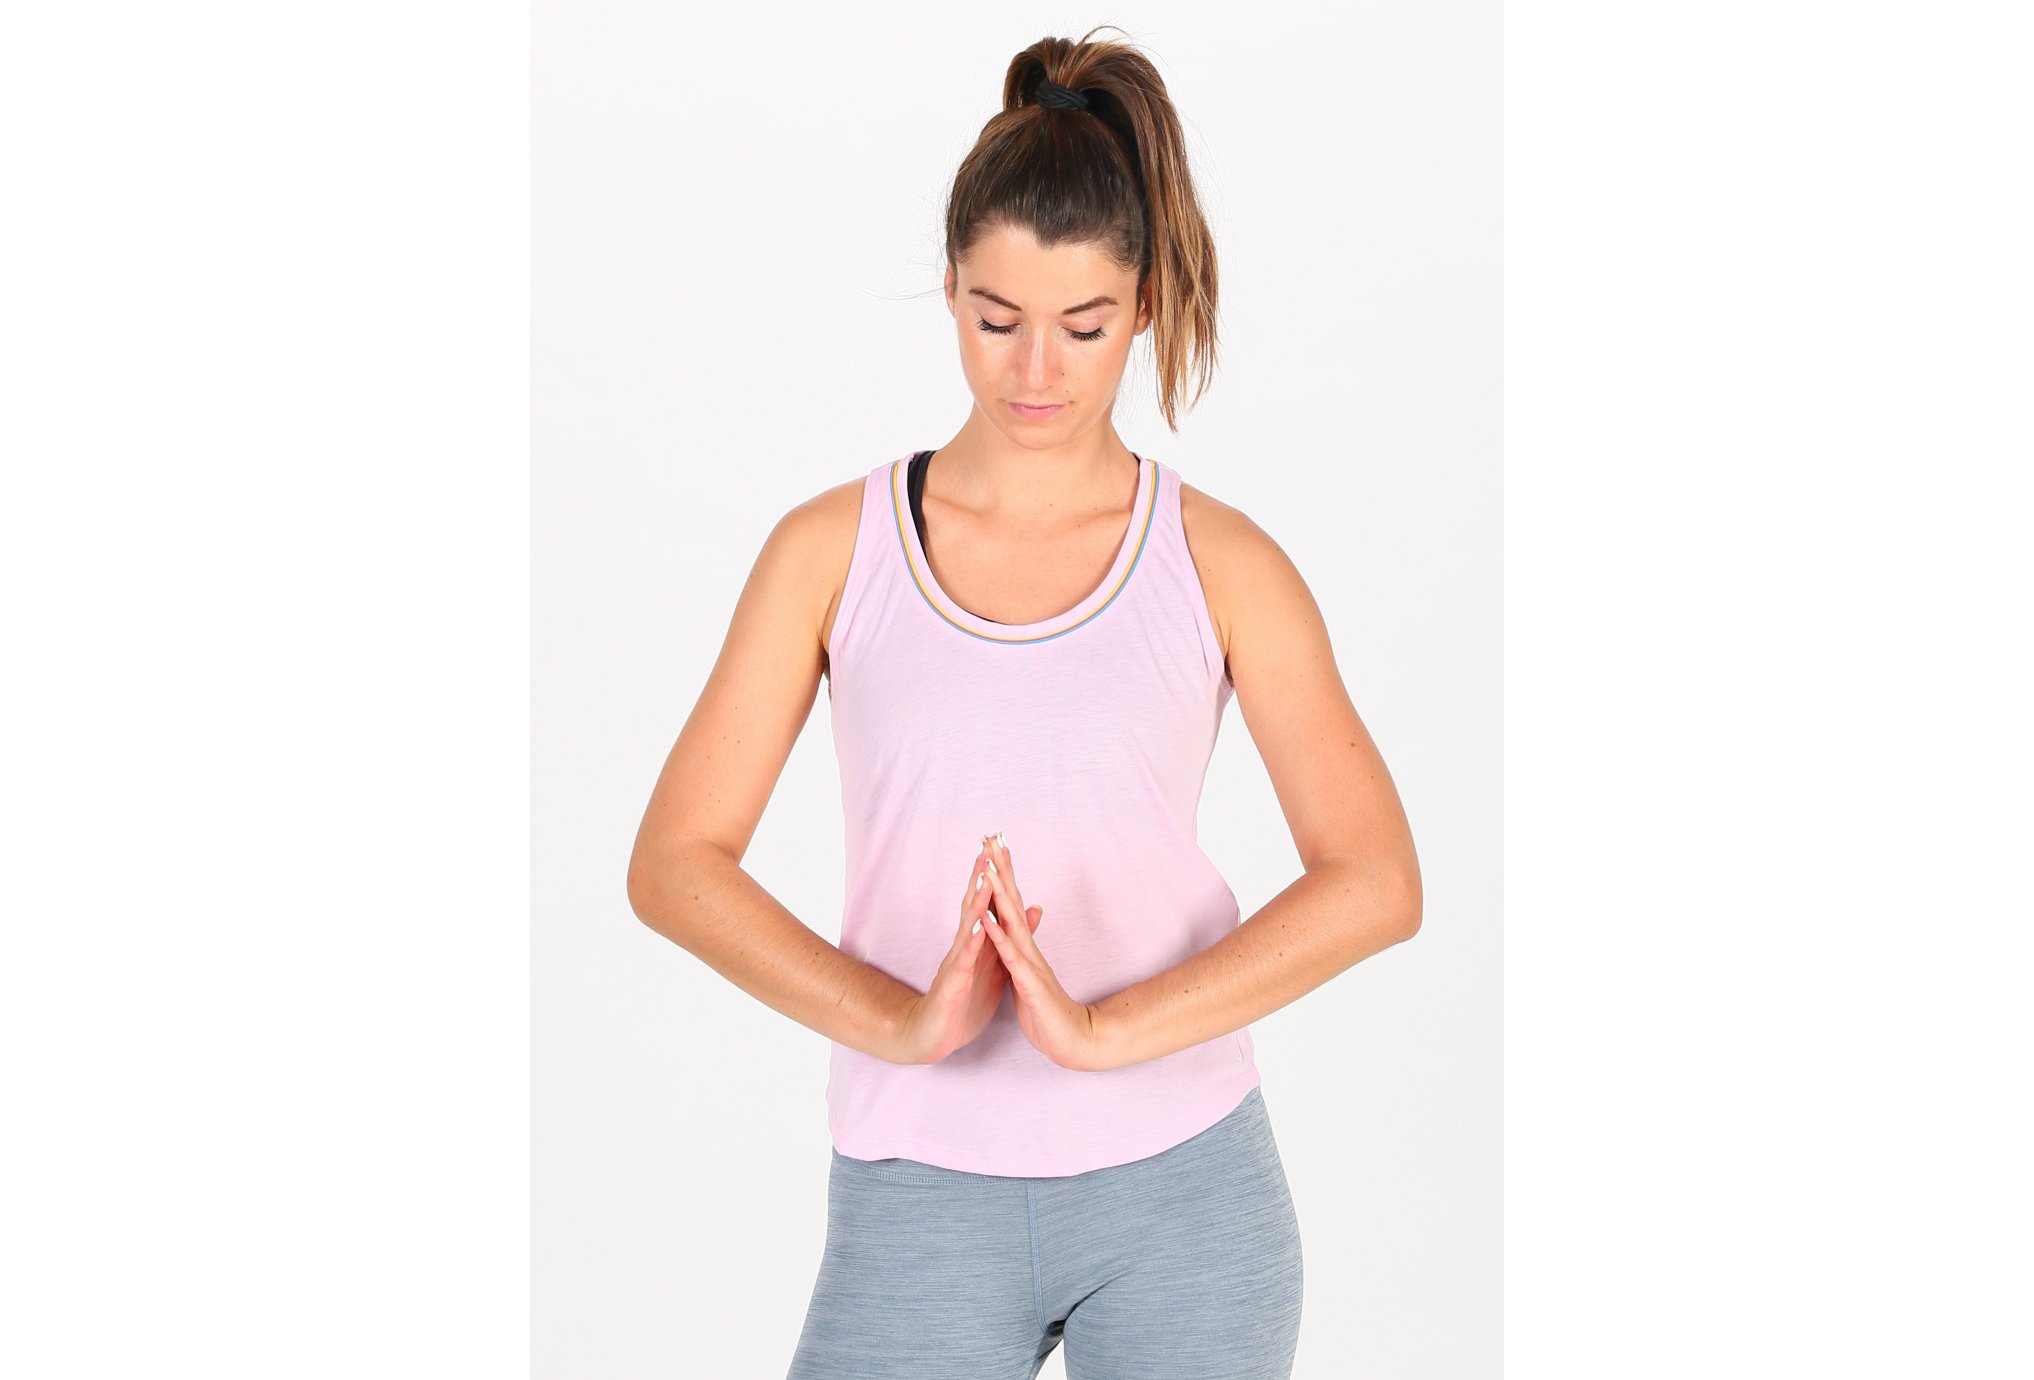 Nike Yoga Core Vintage Vinyasa 2 W vêtement running femme